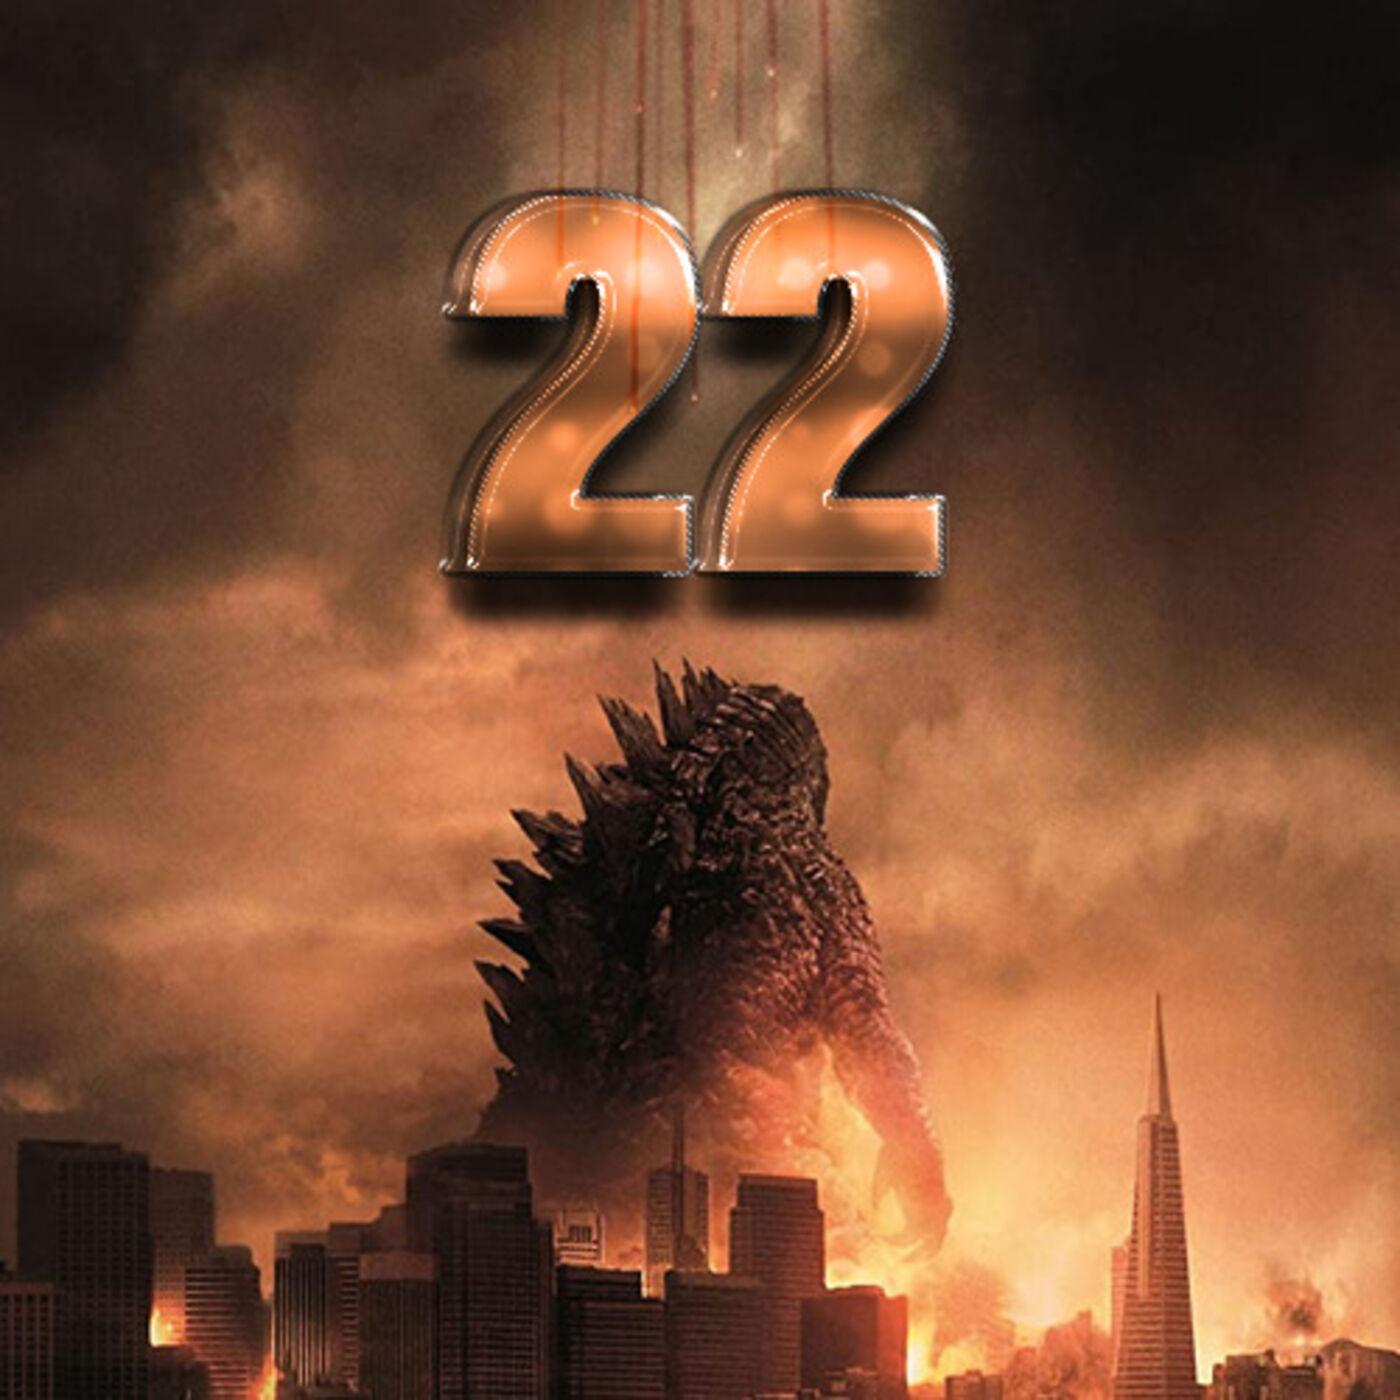 Ep 22 - The Road to Godzilla vs. Kong, Pt. 1: Godzilla (2014)